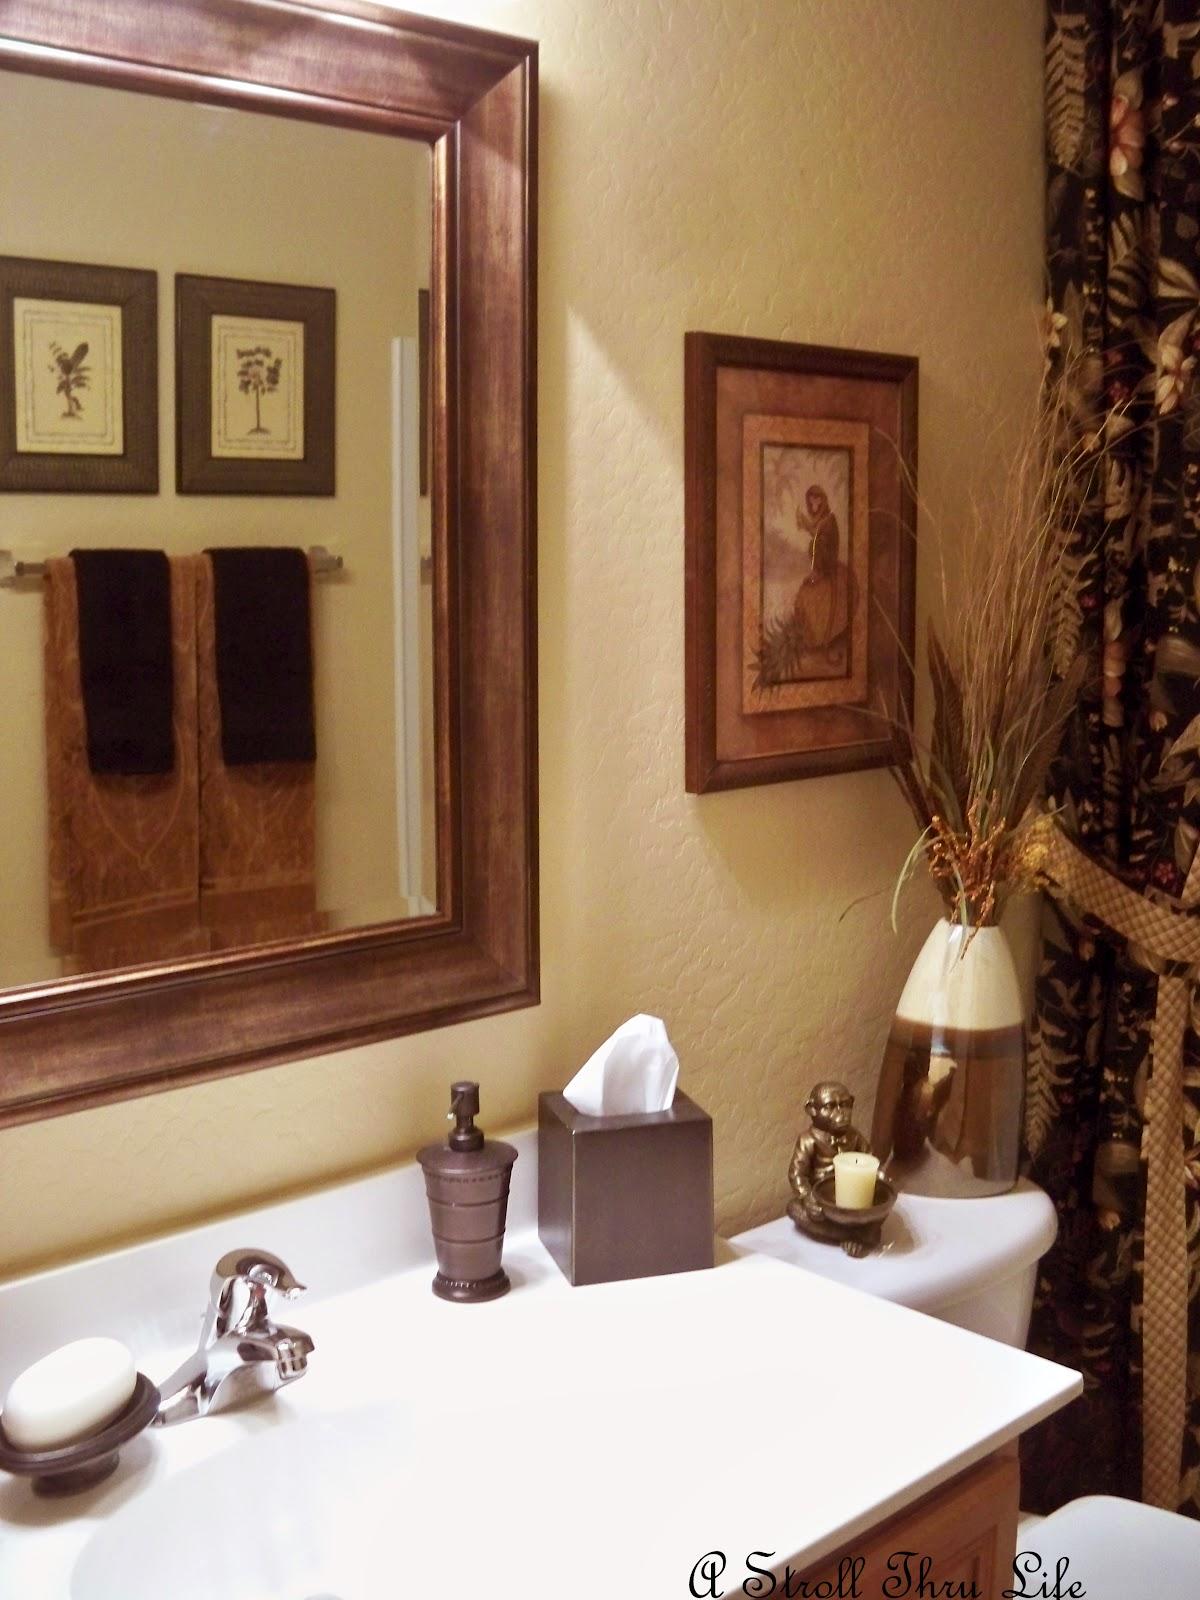 Show Us Your Life Bathrooms A Stroll Thru Life